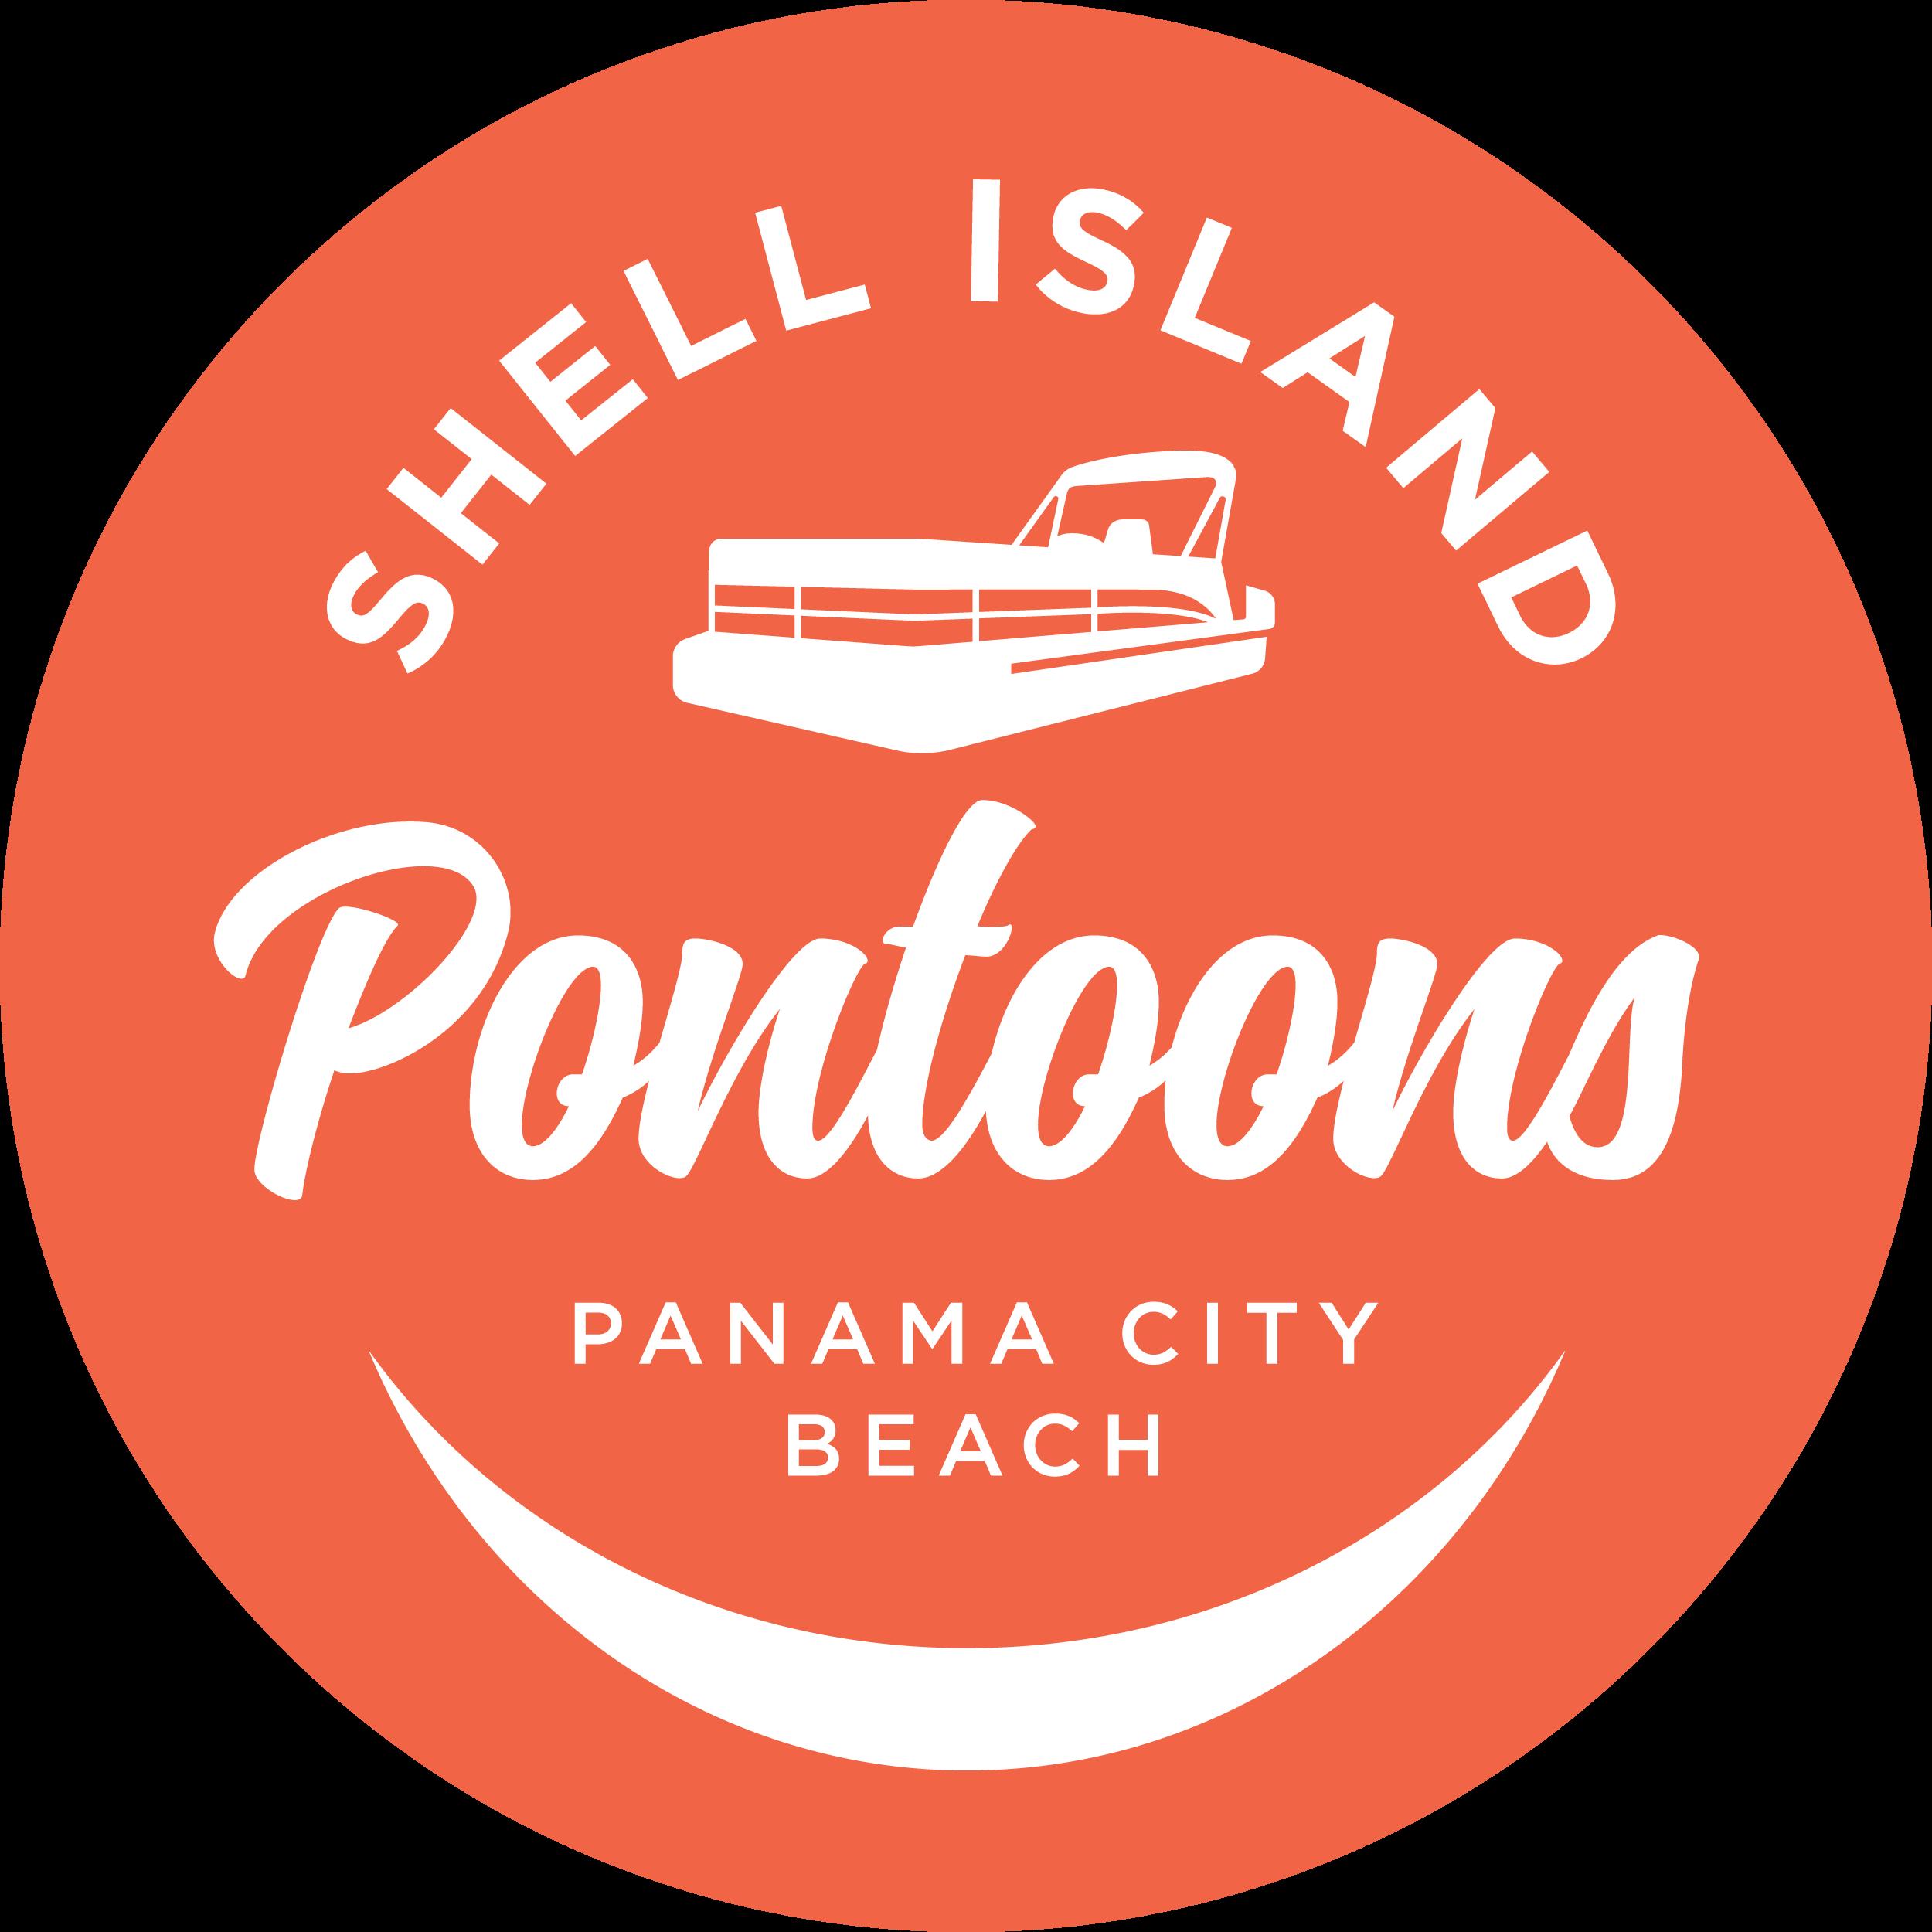 Shell Island Pontoons